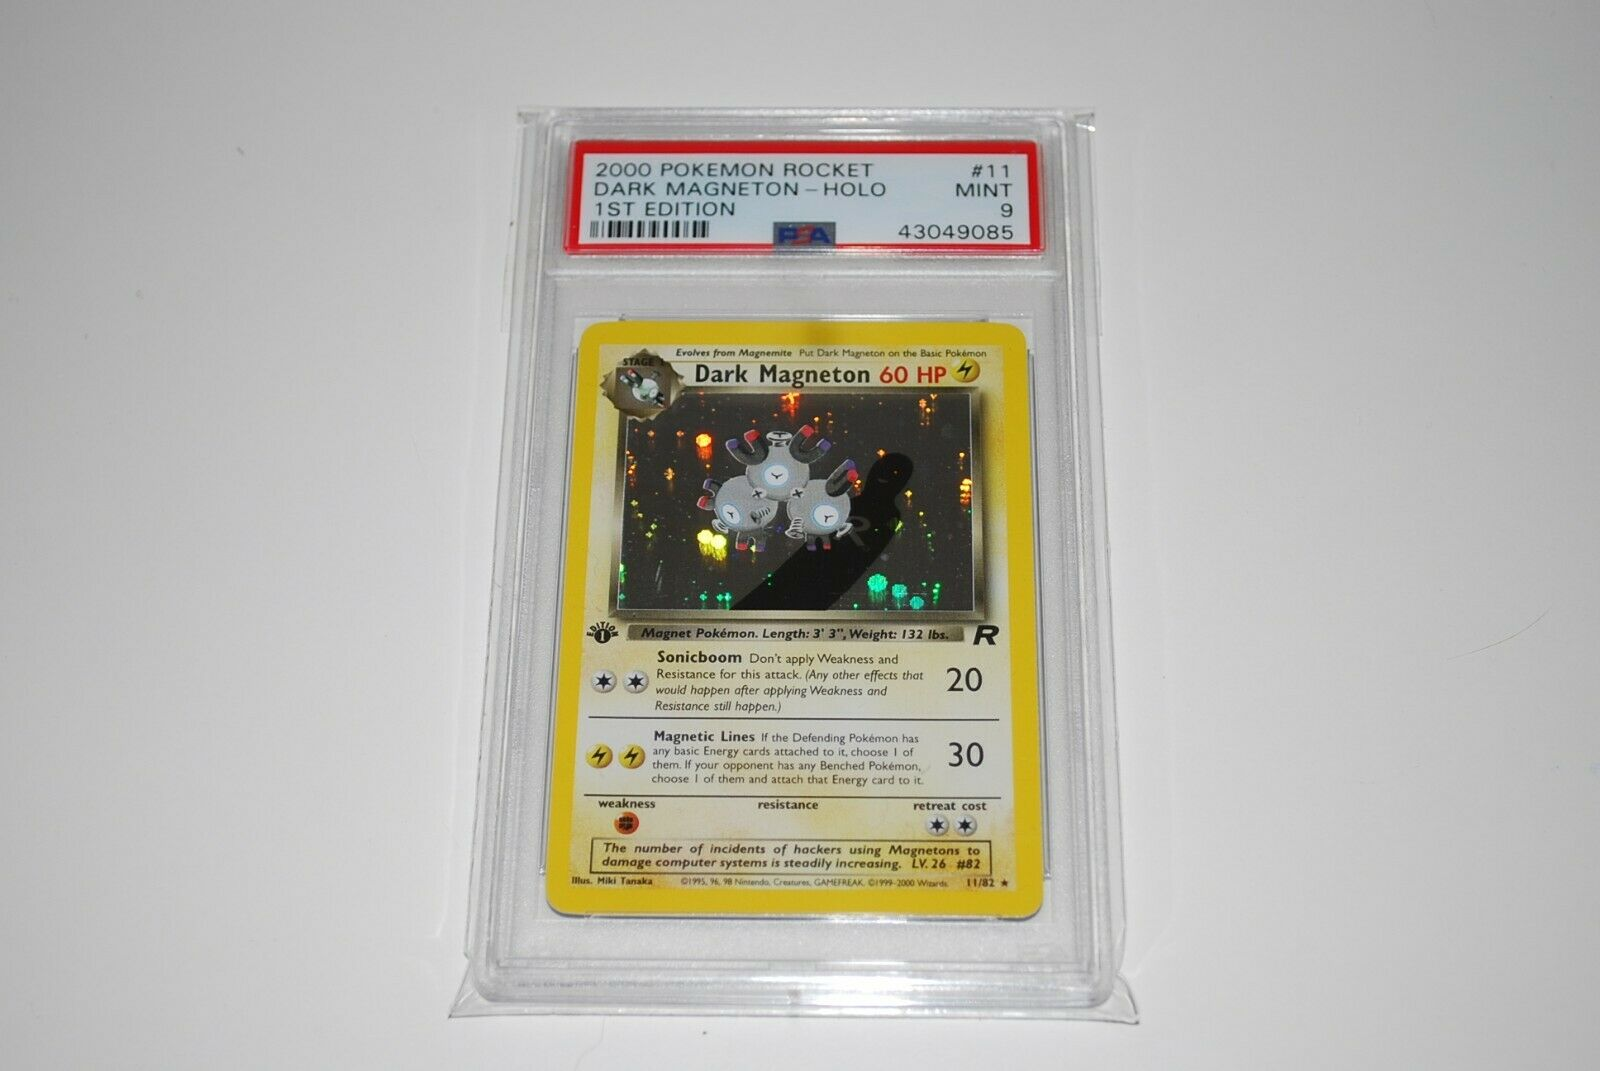 PSA 9 Mint 1st Edition Dark Magneton Holo 1182 Pokemon Card 19992000